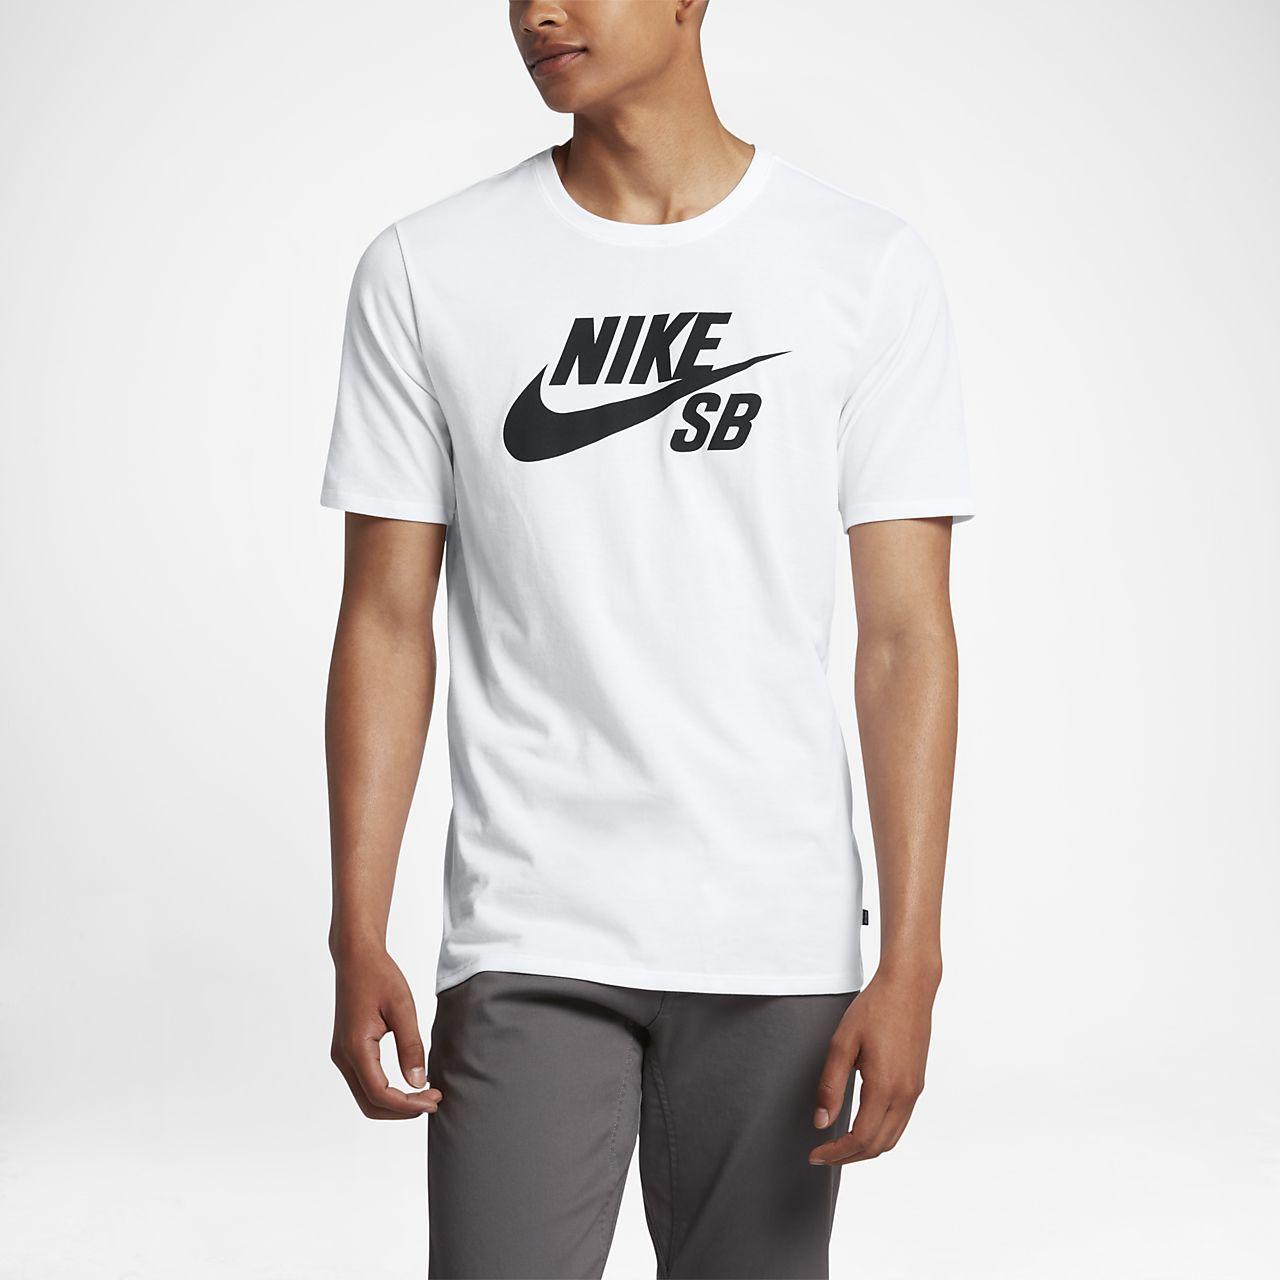 nike sb hombre camiseta